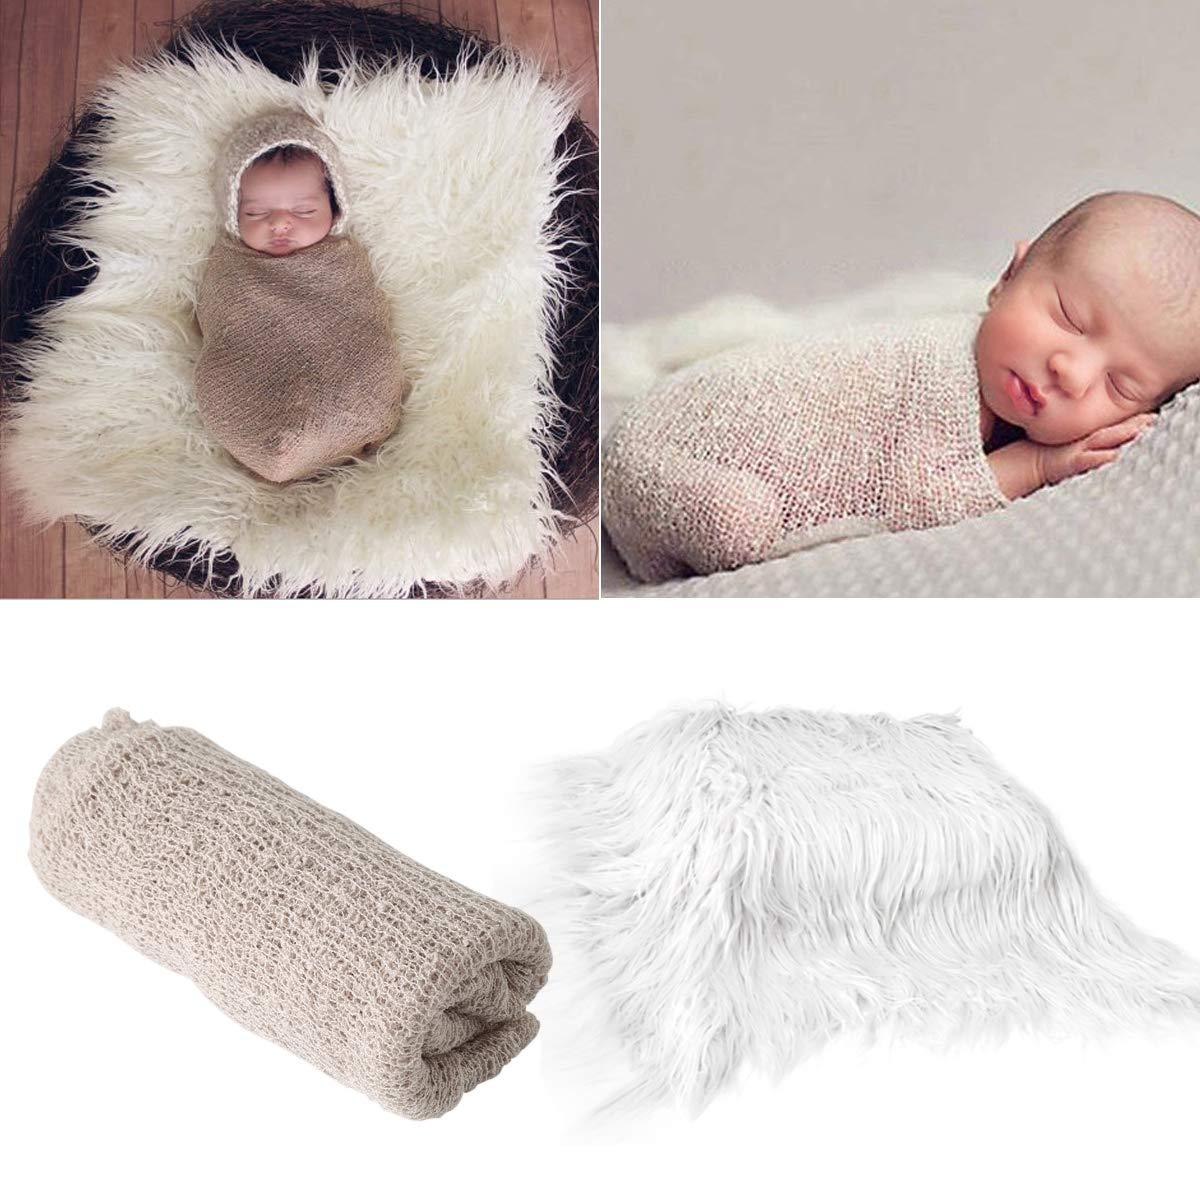 Newborn Baby Photo Photograph Props Blanket Soft Fur Mat Backdrop Decor DIY Gift